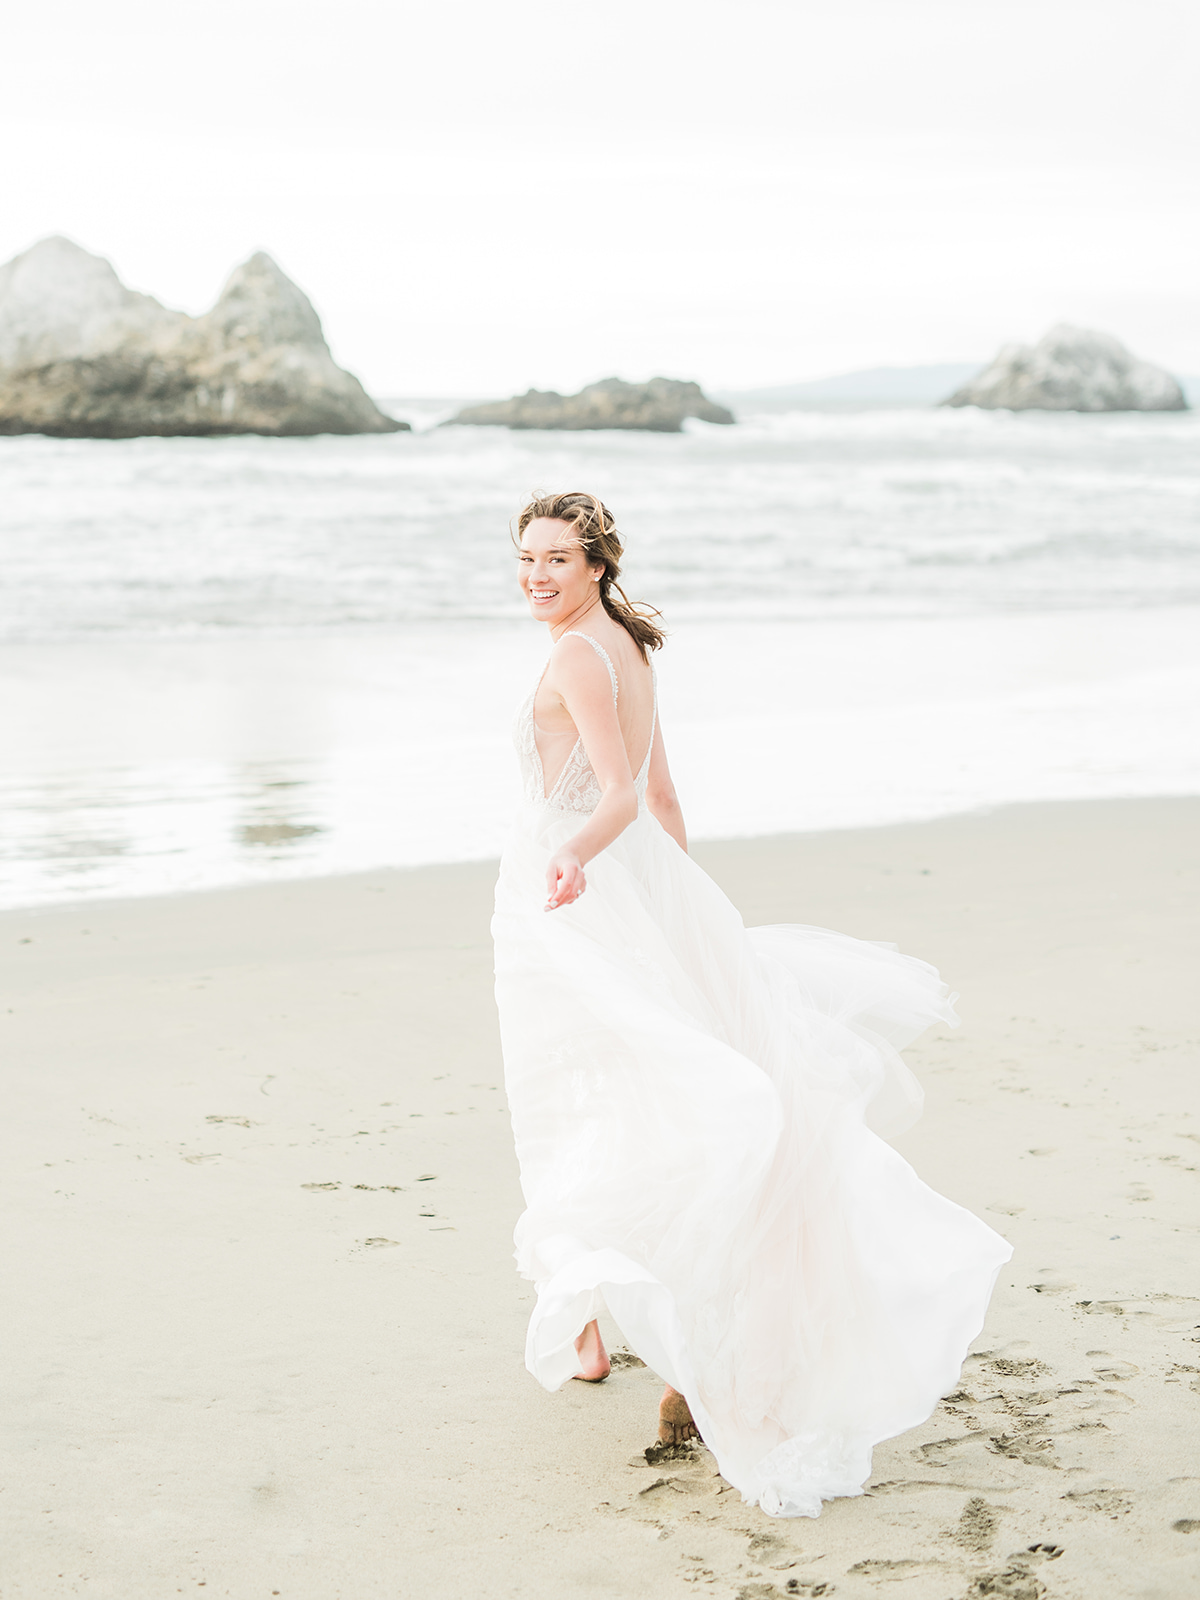 Seaside_Ruins_Janine_Licare_Photography-176.jpg